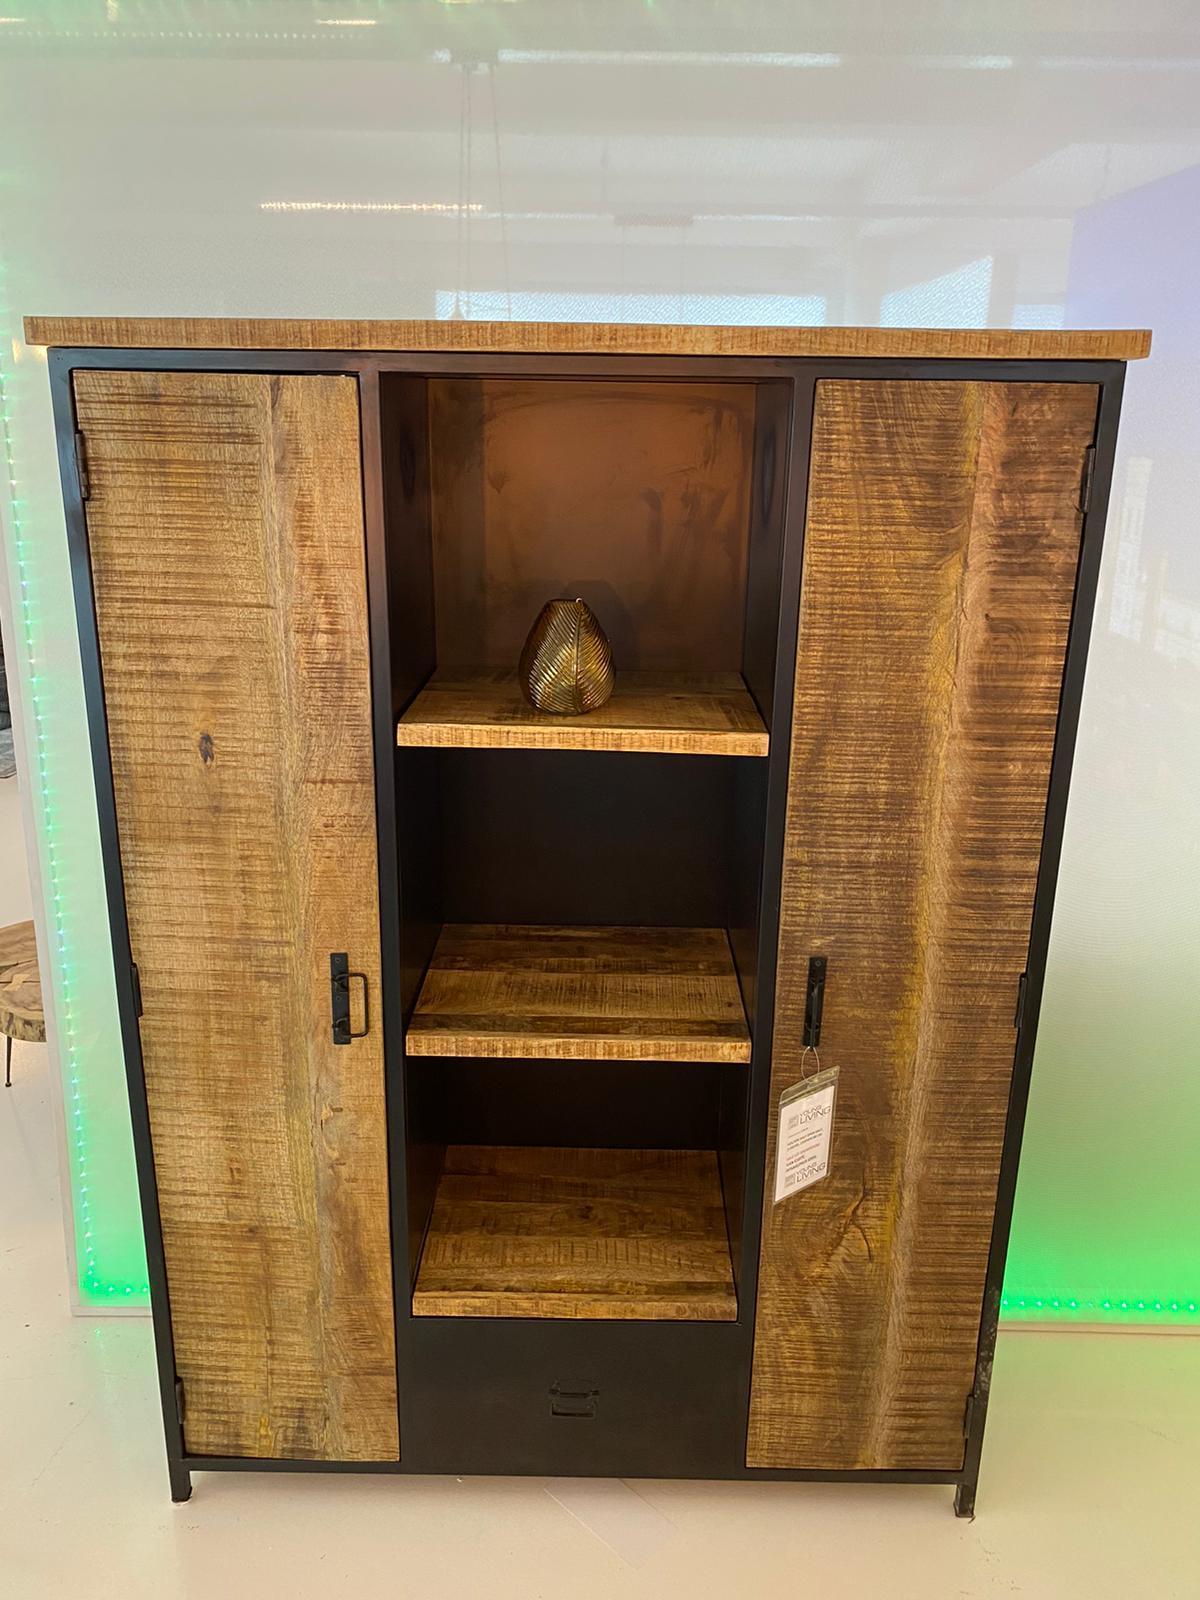 76. Houten half open kast, 1128-42